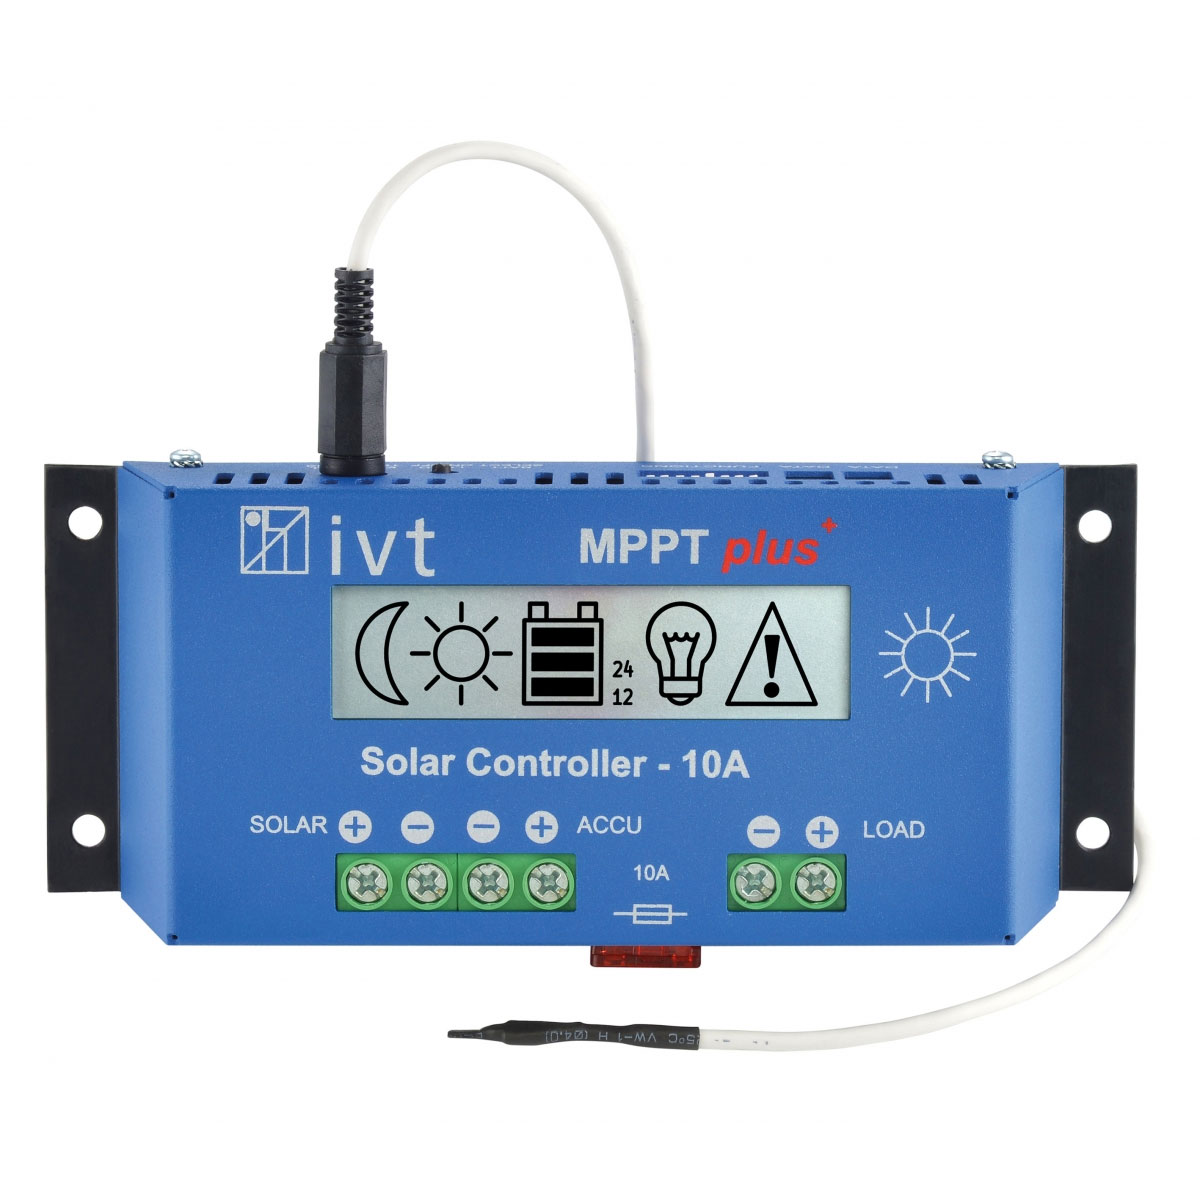 MPPTplus+ solar controller 10 A